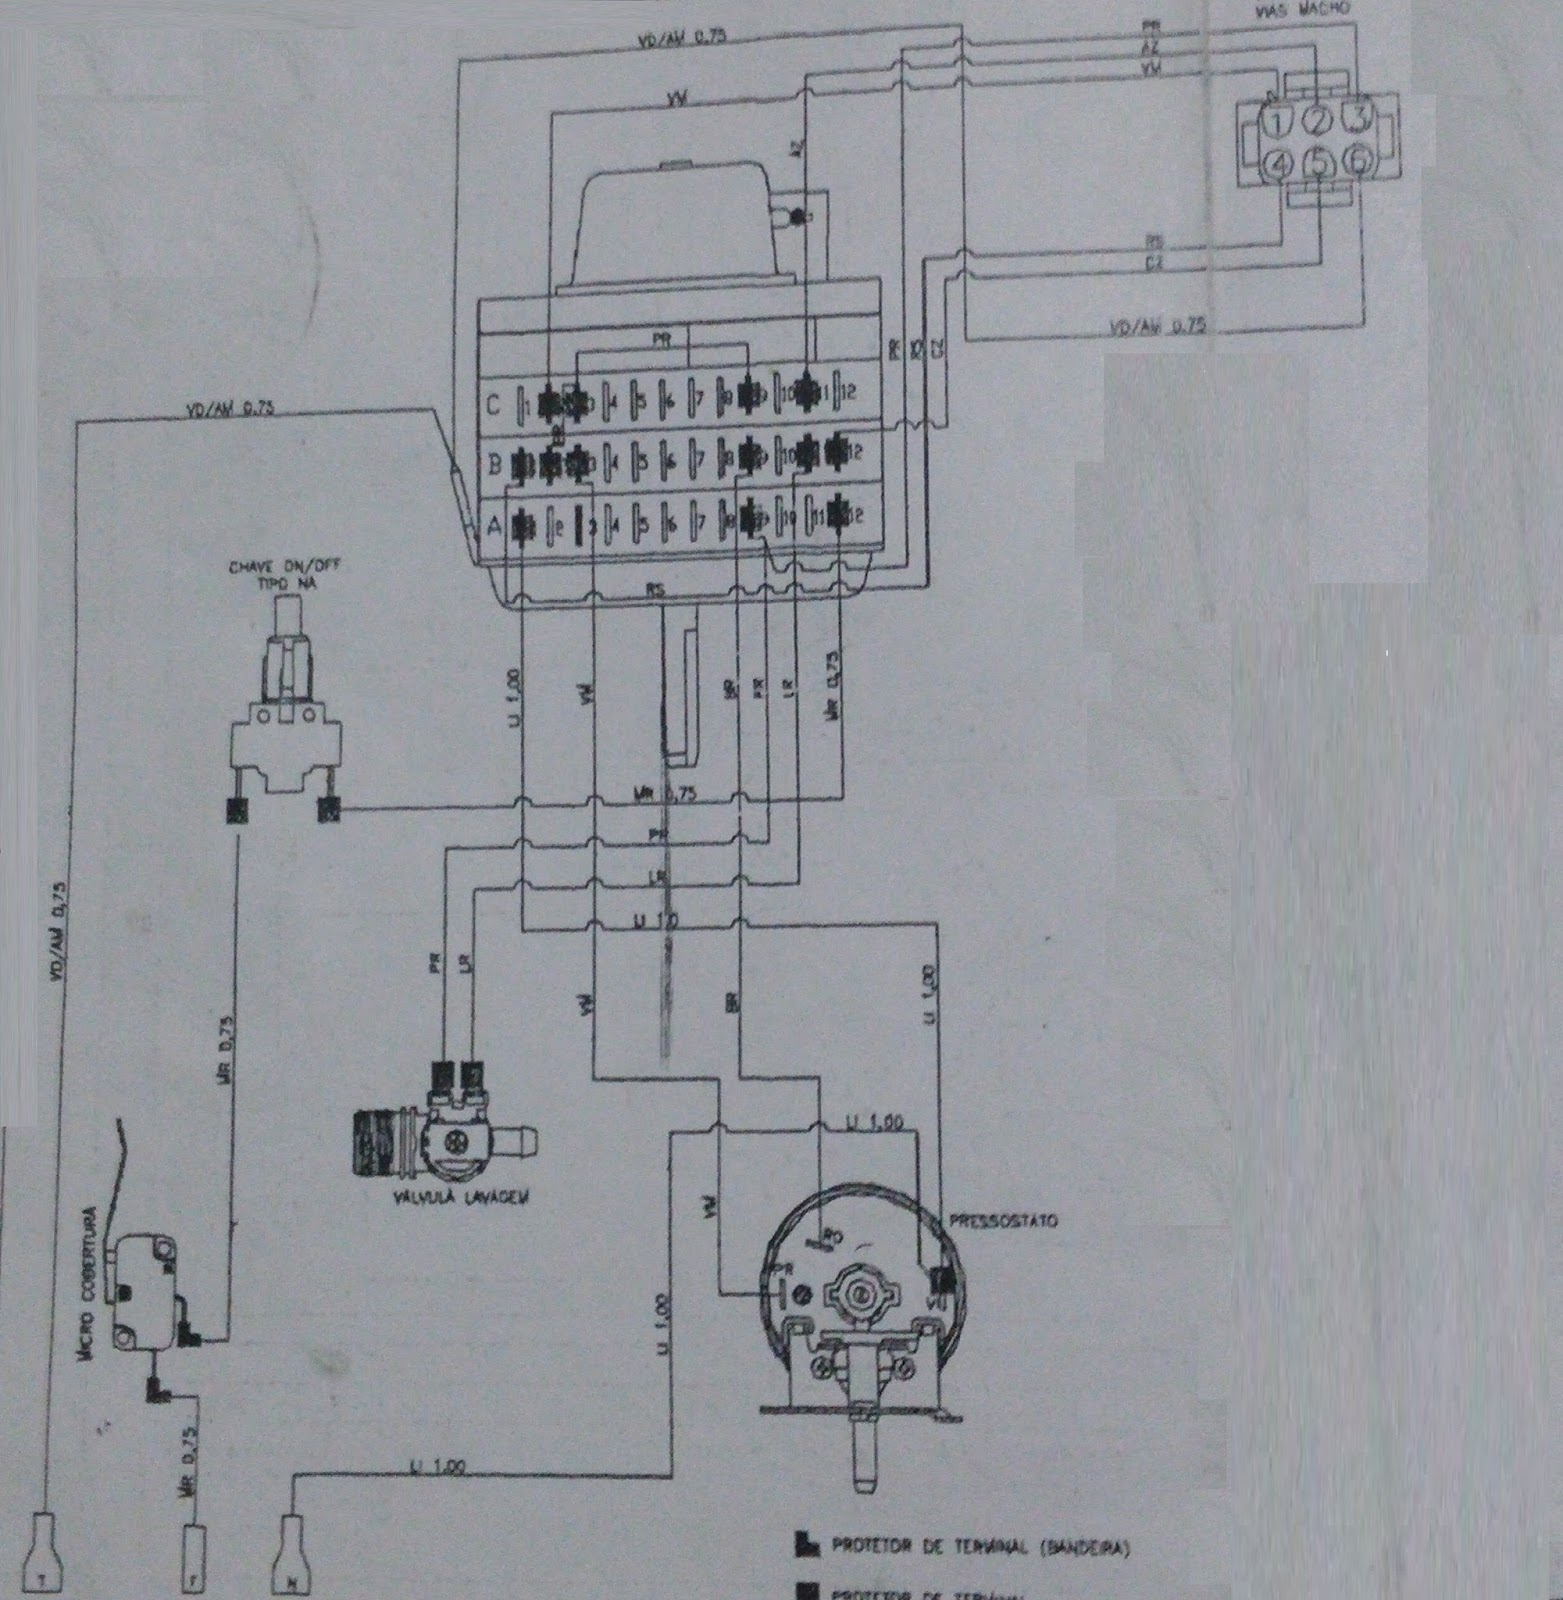 Consertando Minha Maquina De Lavar Diagrama Pictorico